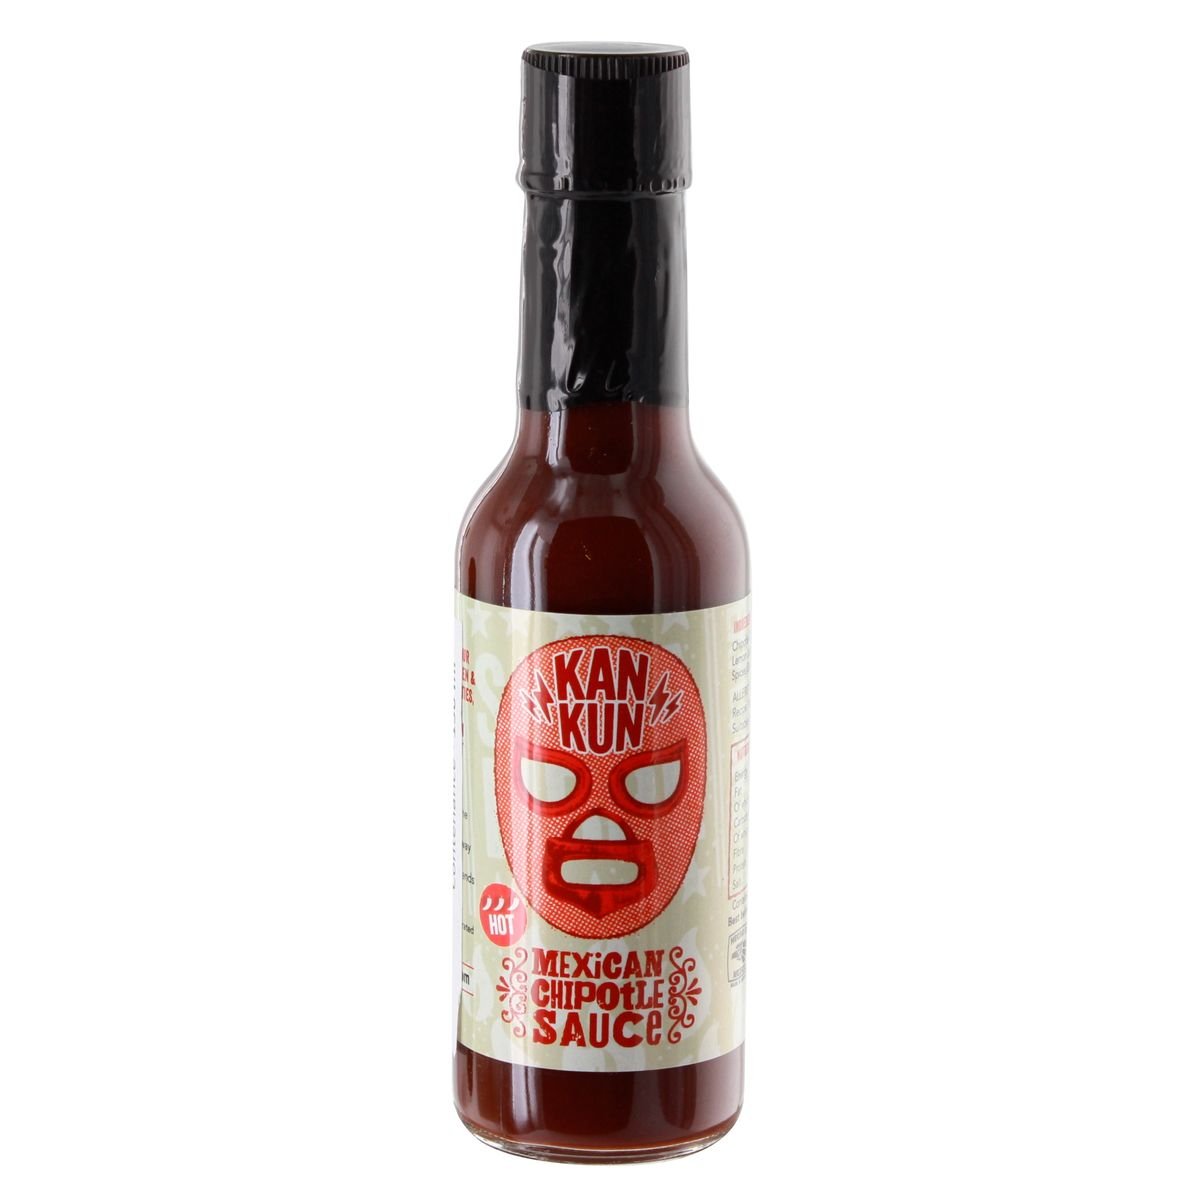 Chipotle sauce - Kankun